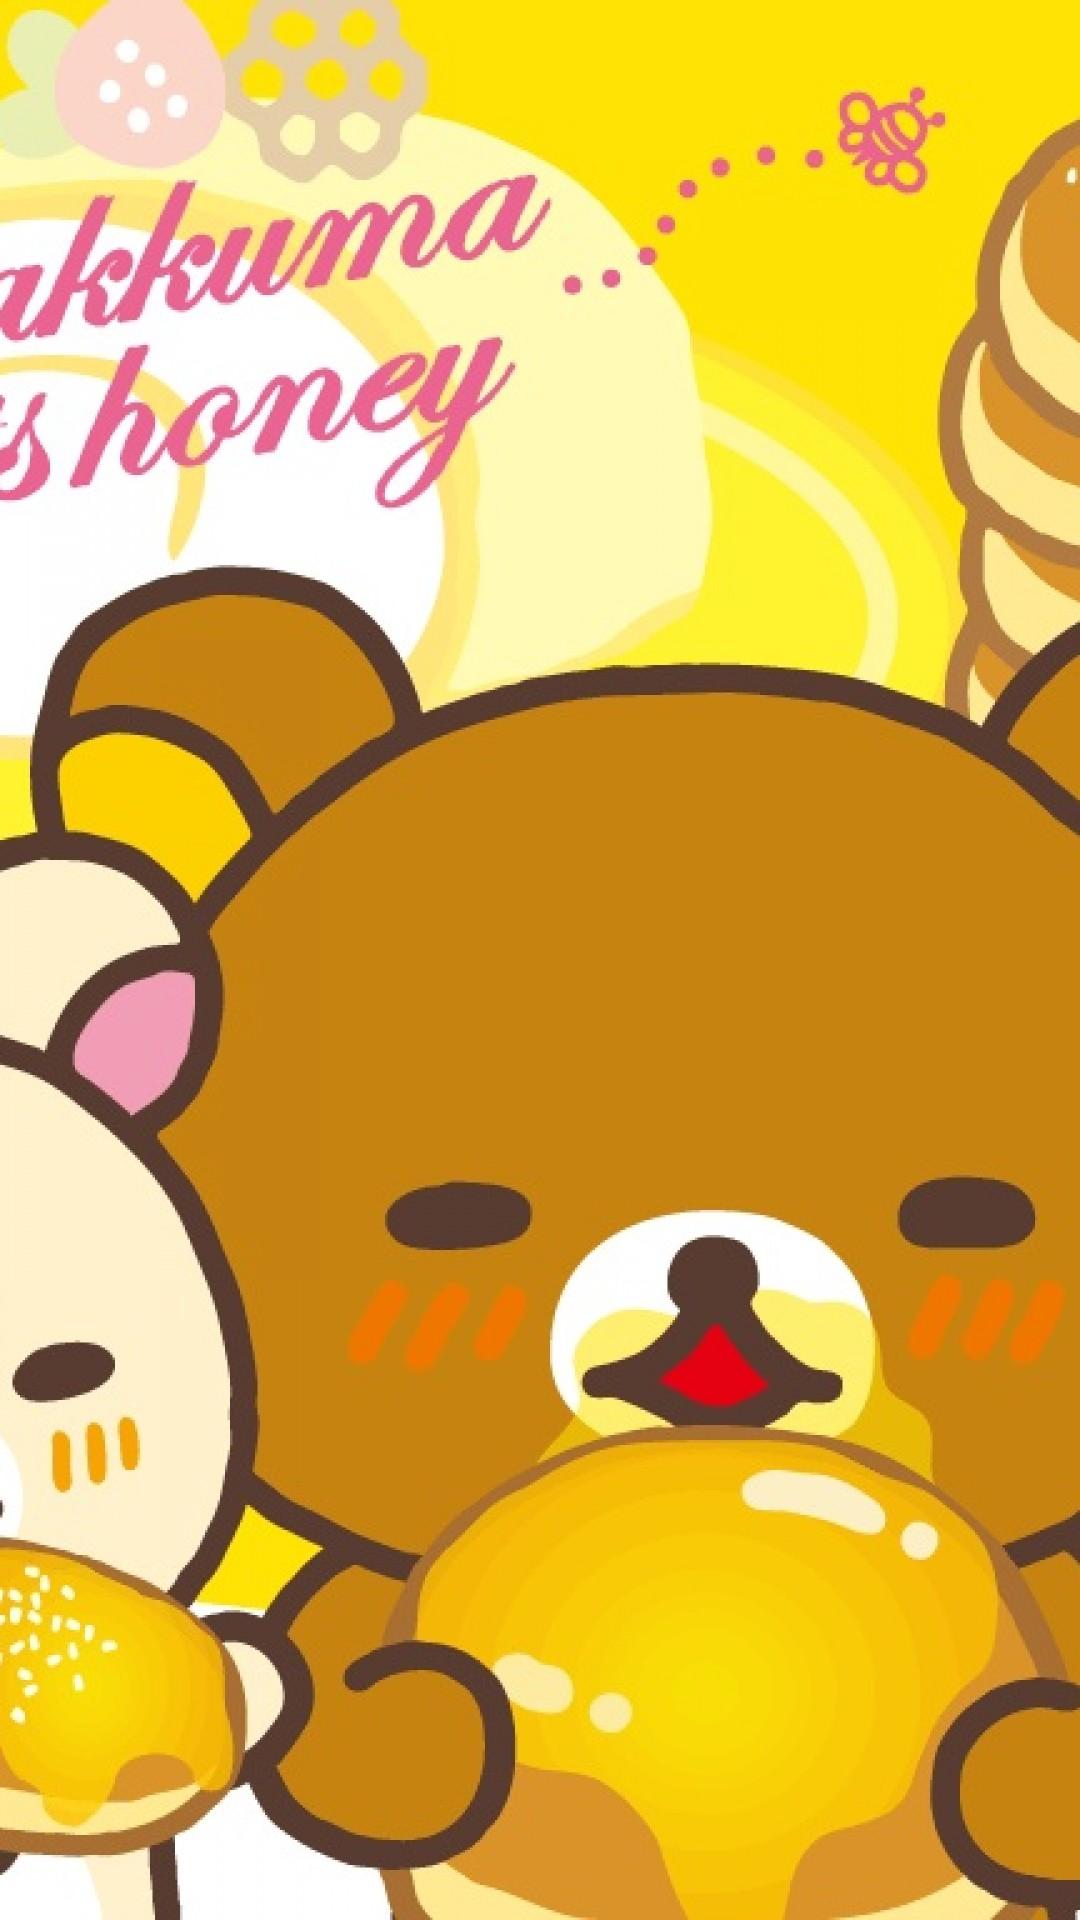 Cute Girly Wallpapers For Phone Rilakkuma Iphone6s Wallpaper Iphone Wallpaper